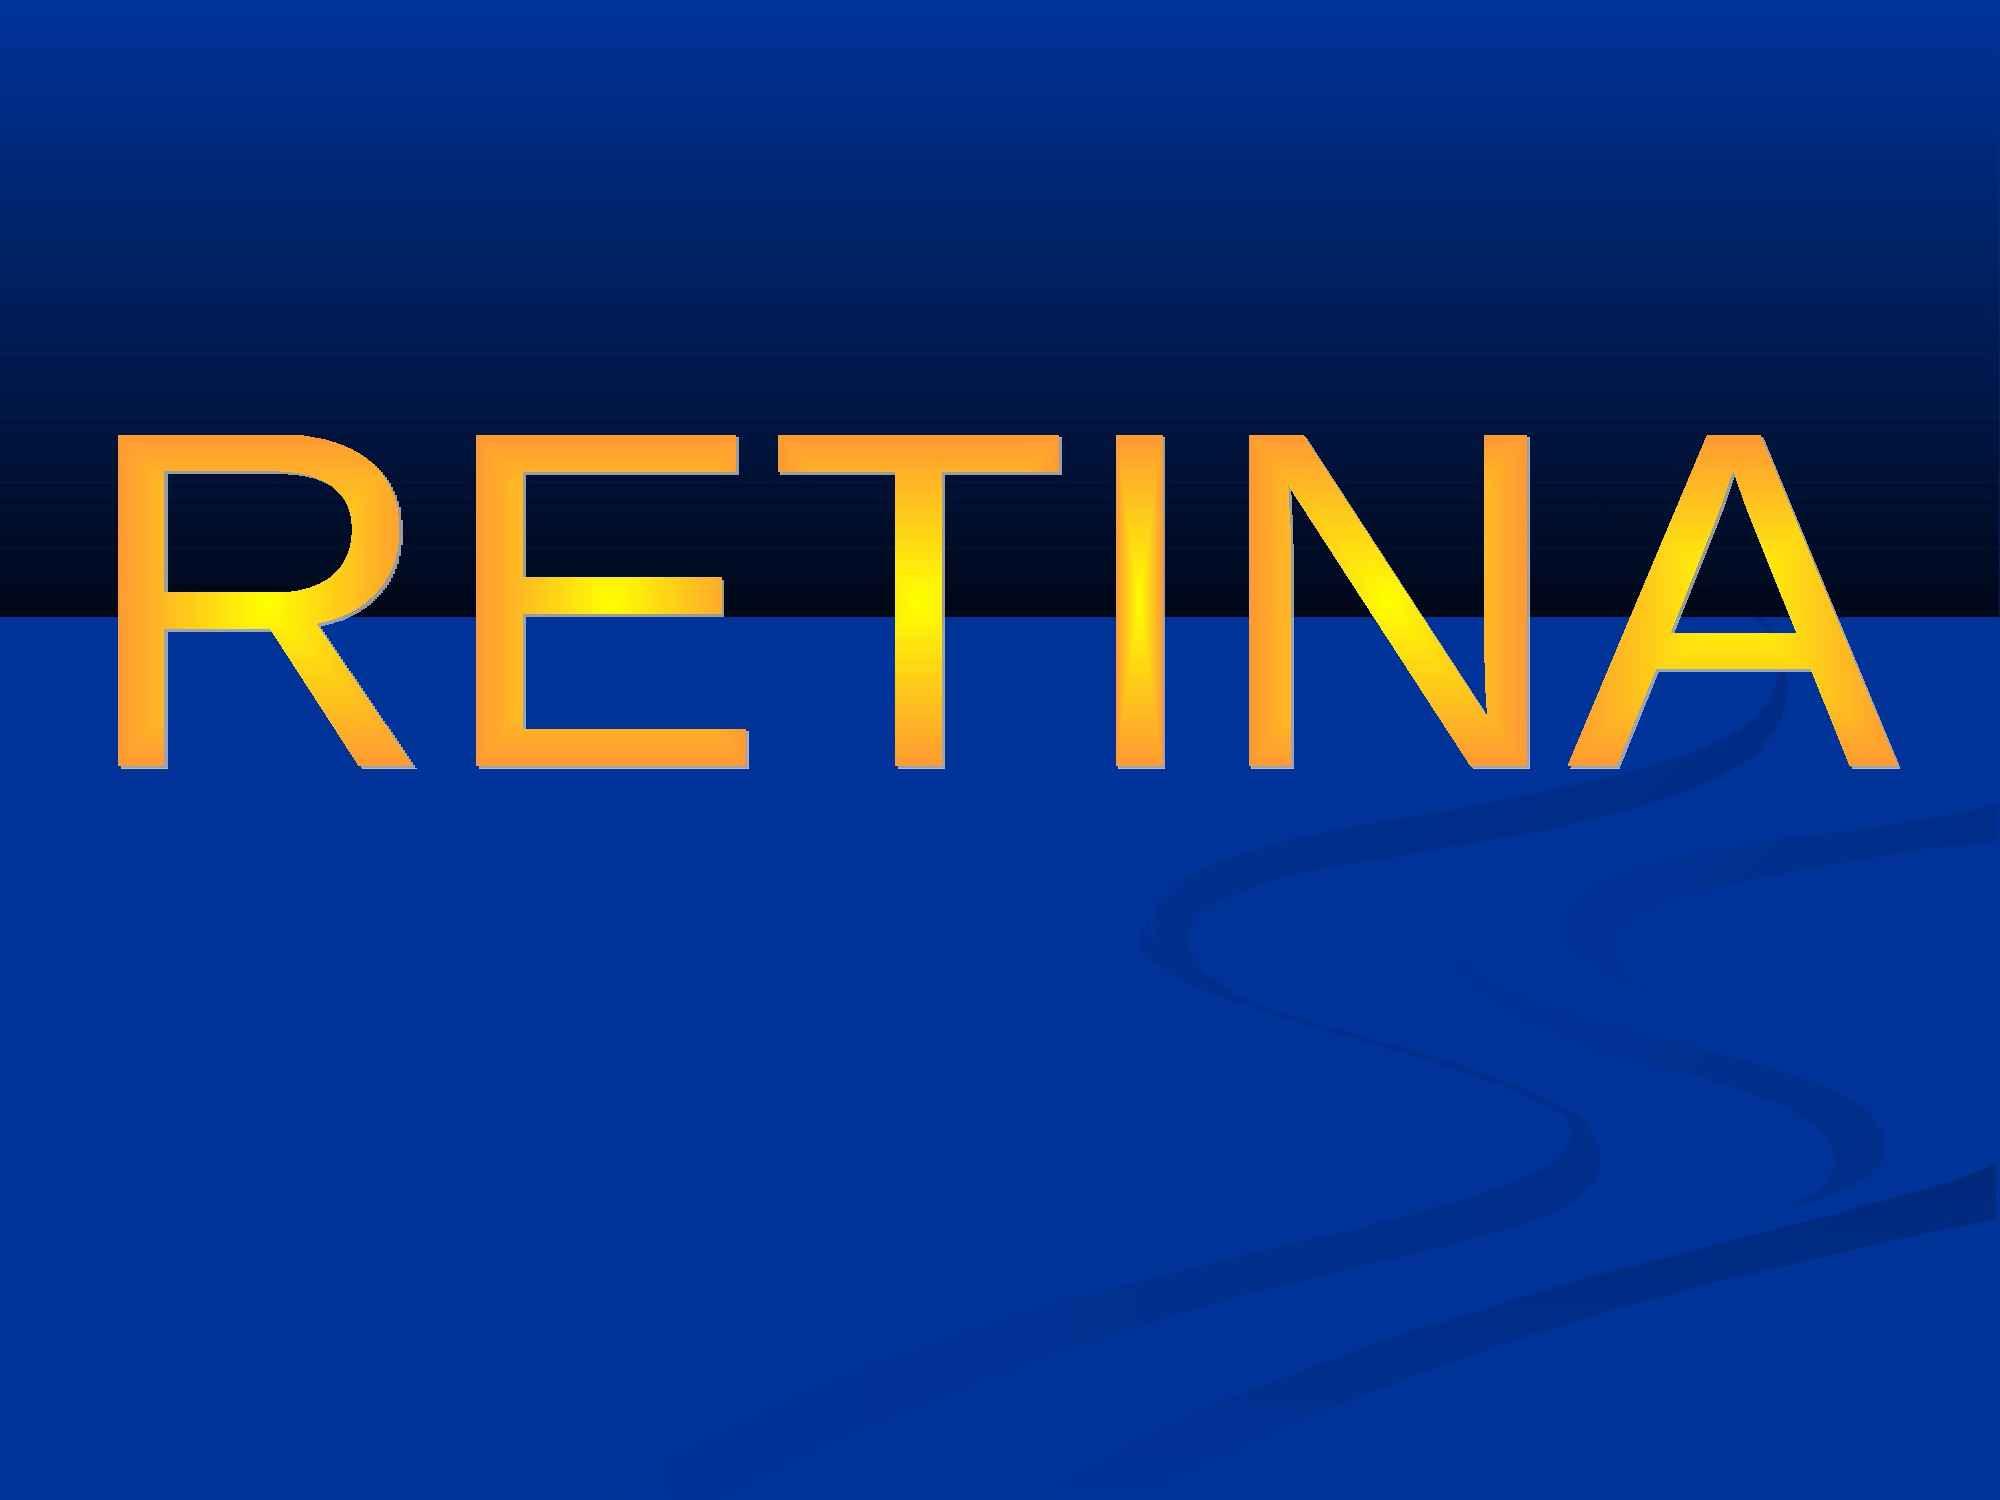 Retina - Distrofie retiniche